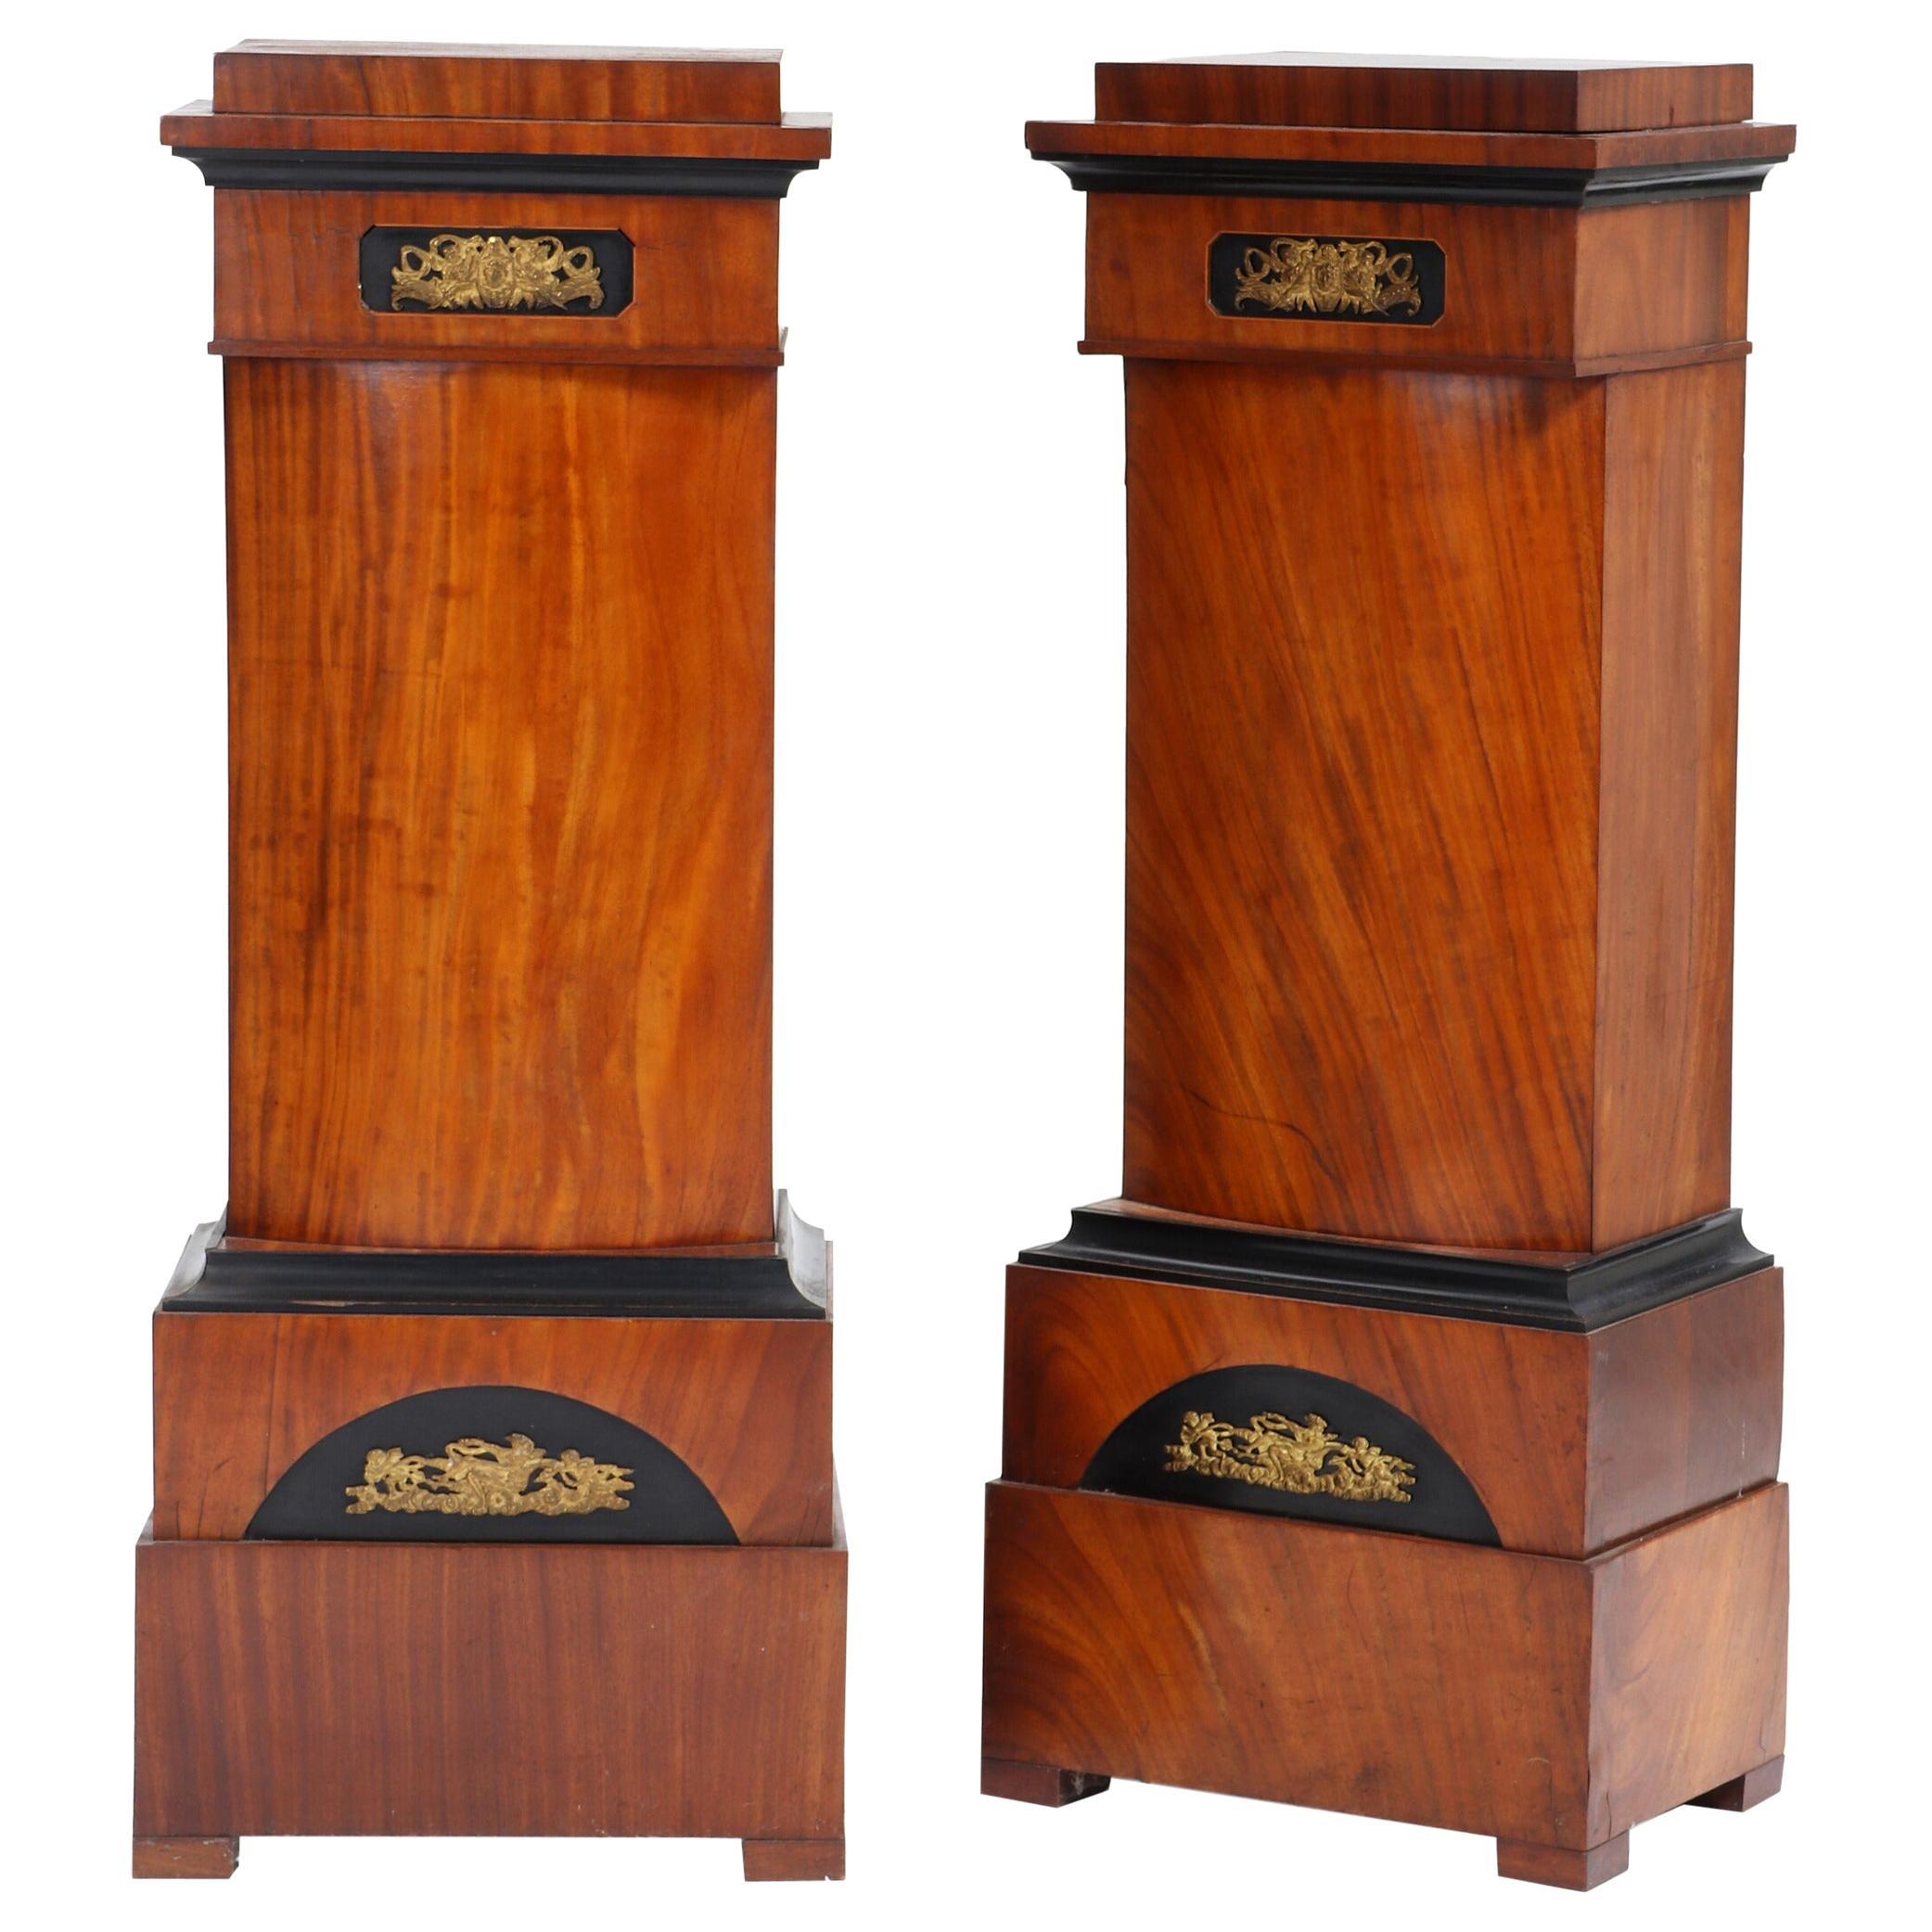 Pair of 19th Century Mahogany Pedestals